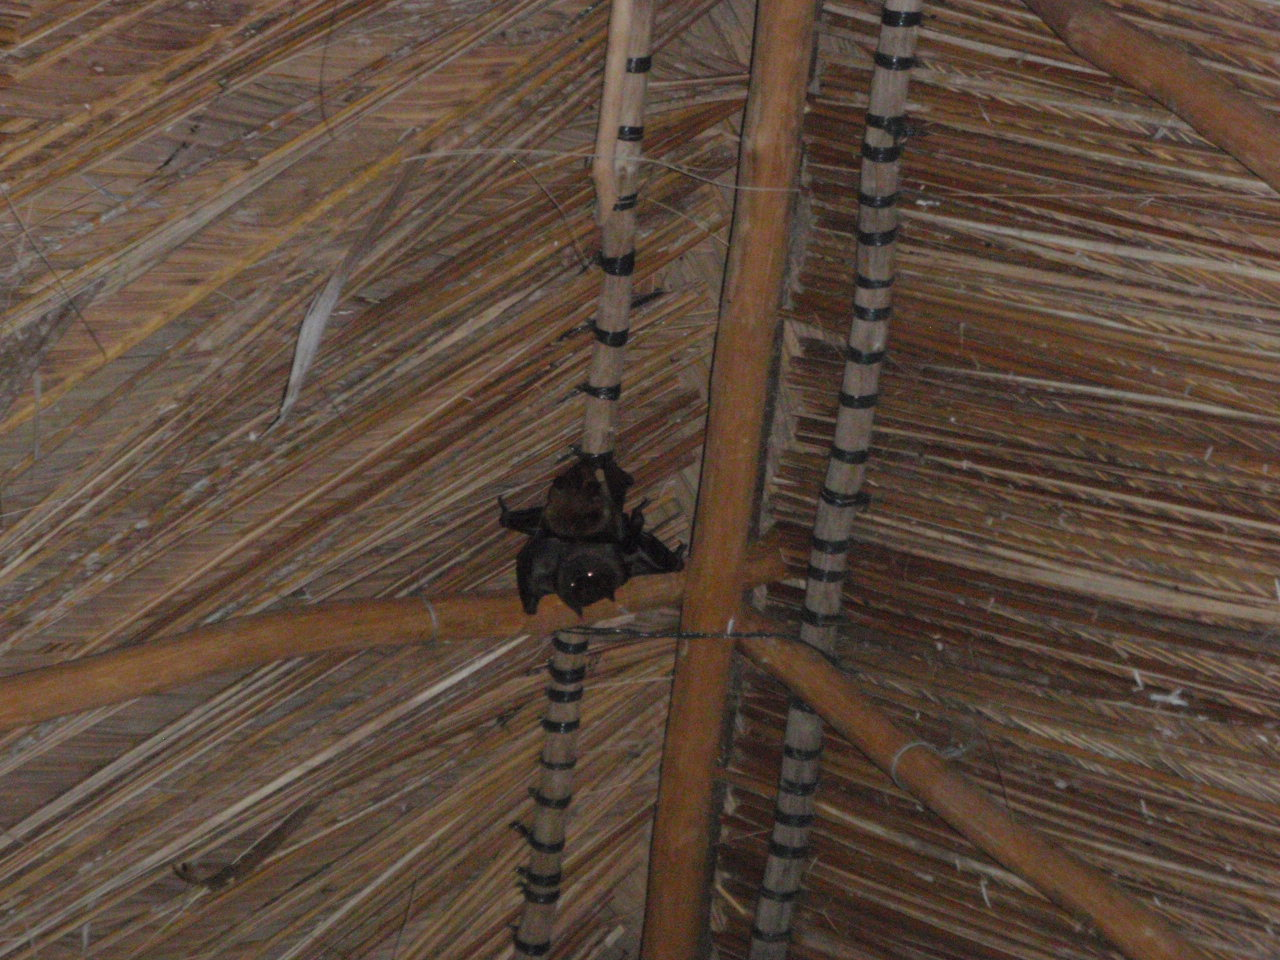 Click image for larger version  Name:Fruit Bats P9170009.JPG Views:71 Size:297.2 KB ID:49307